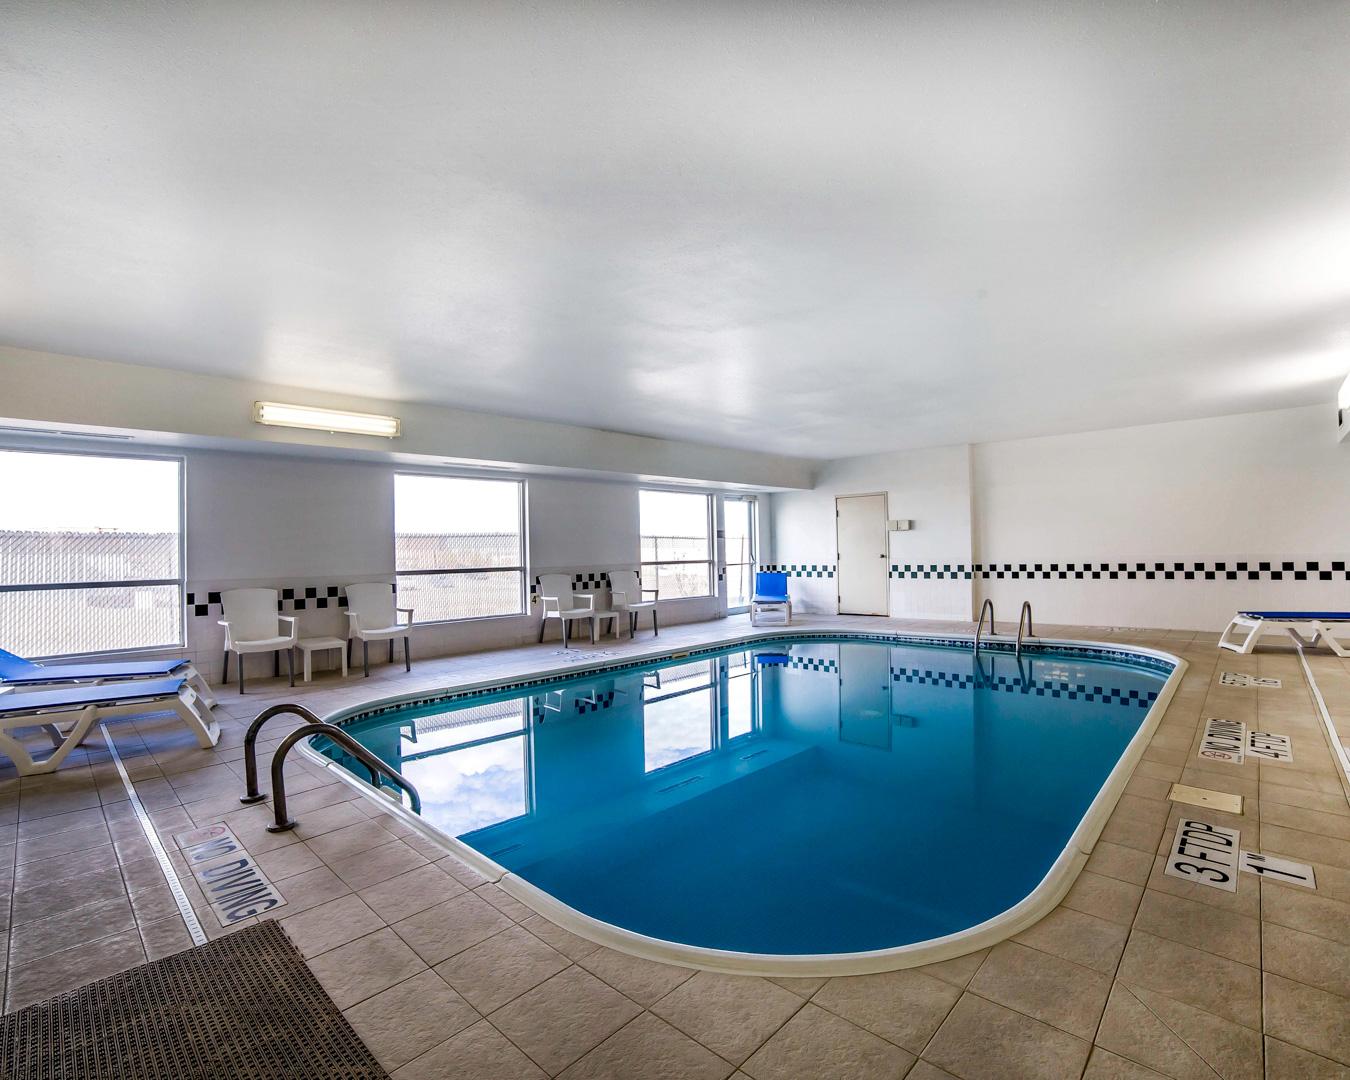 Comfort Inn, Great Falls MT